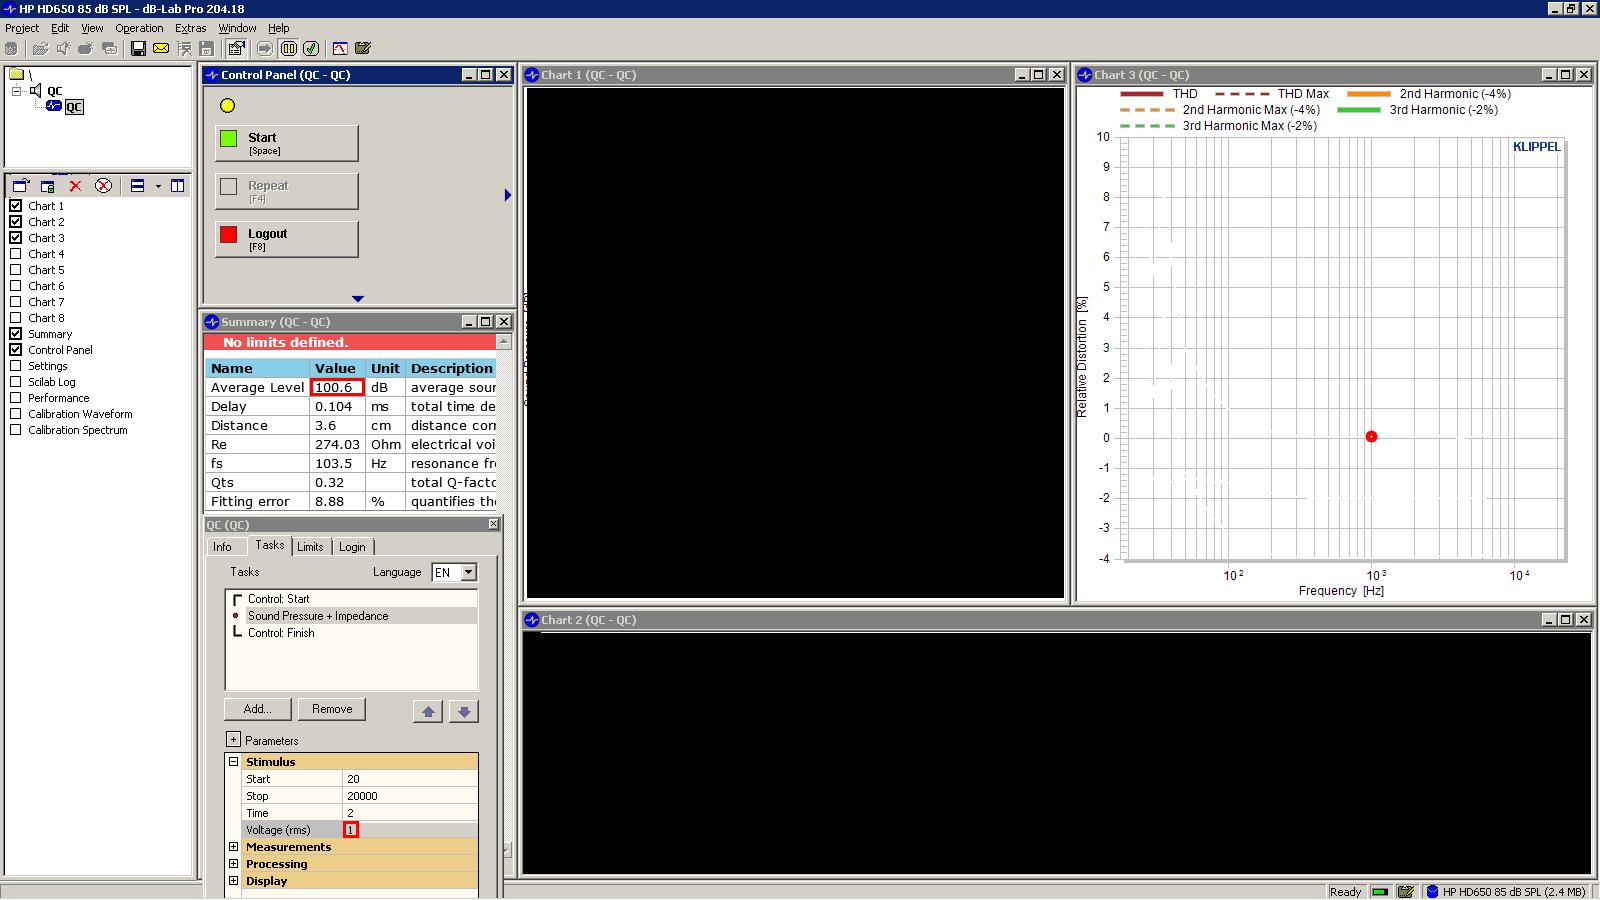 01 20210701 HD650 1V FR Dist Imp L - single point THD 1 KHz _05 pct.png